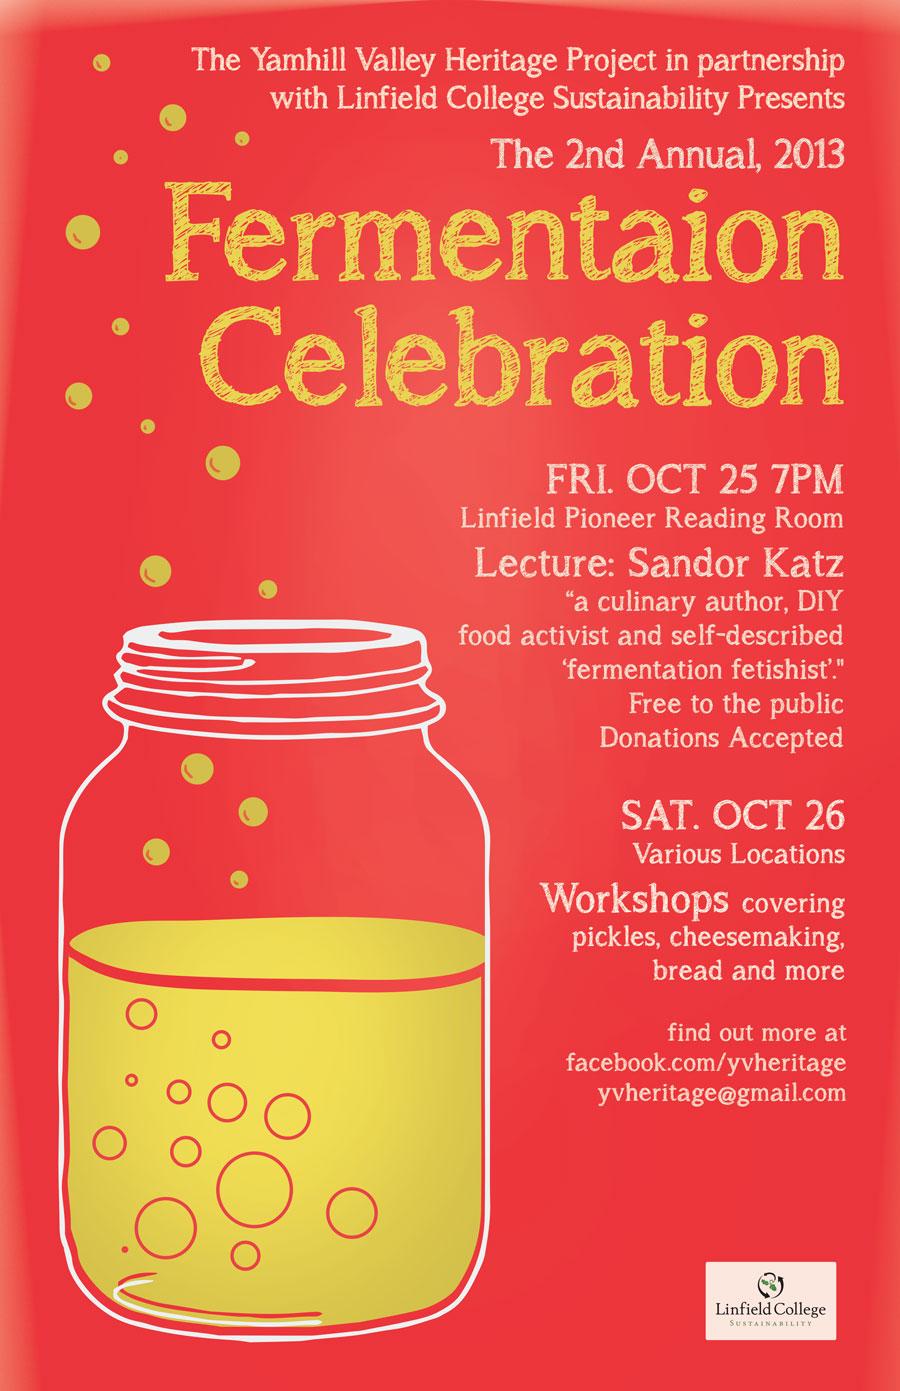 fermentation.celebration.2013